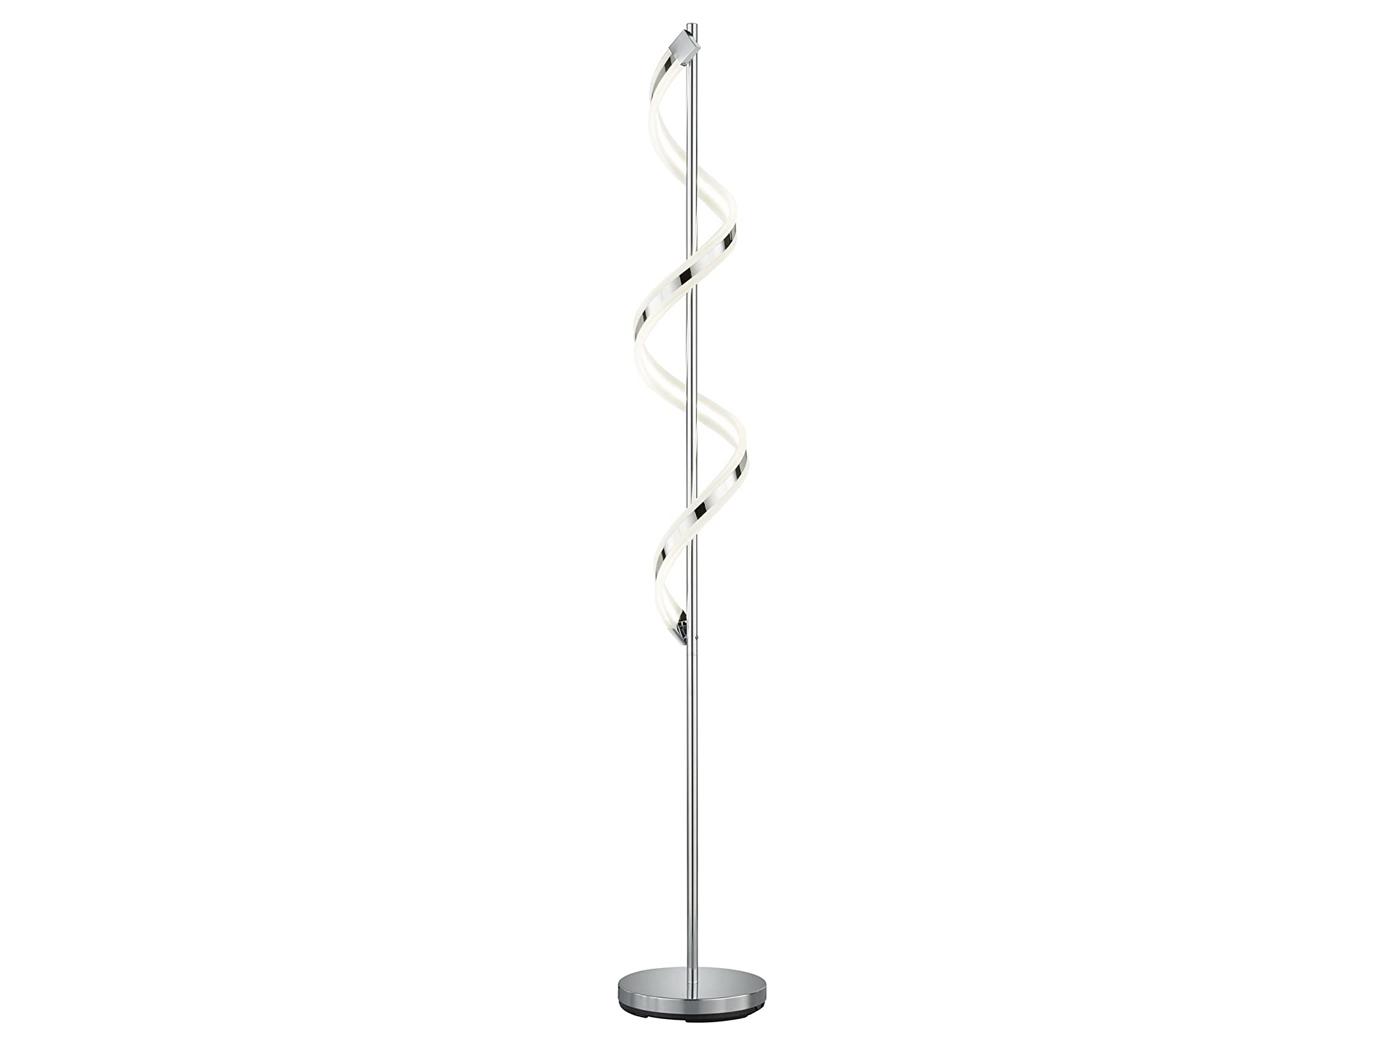 Fußdimmer 1x 20W LED 162 cm LED Stehleuchte Stehlampe SYDNEY H Trio Chrom